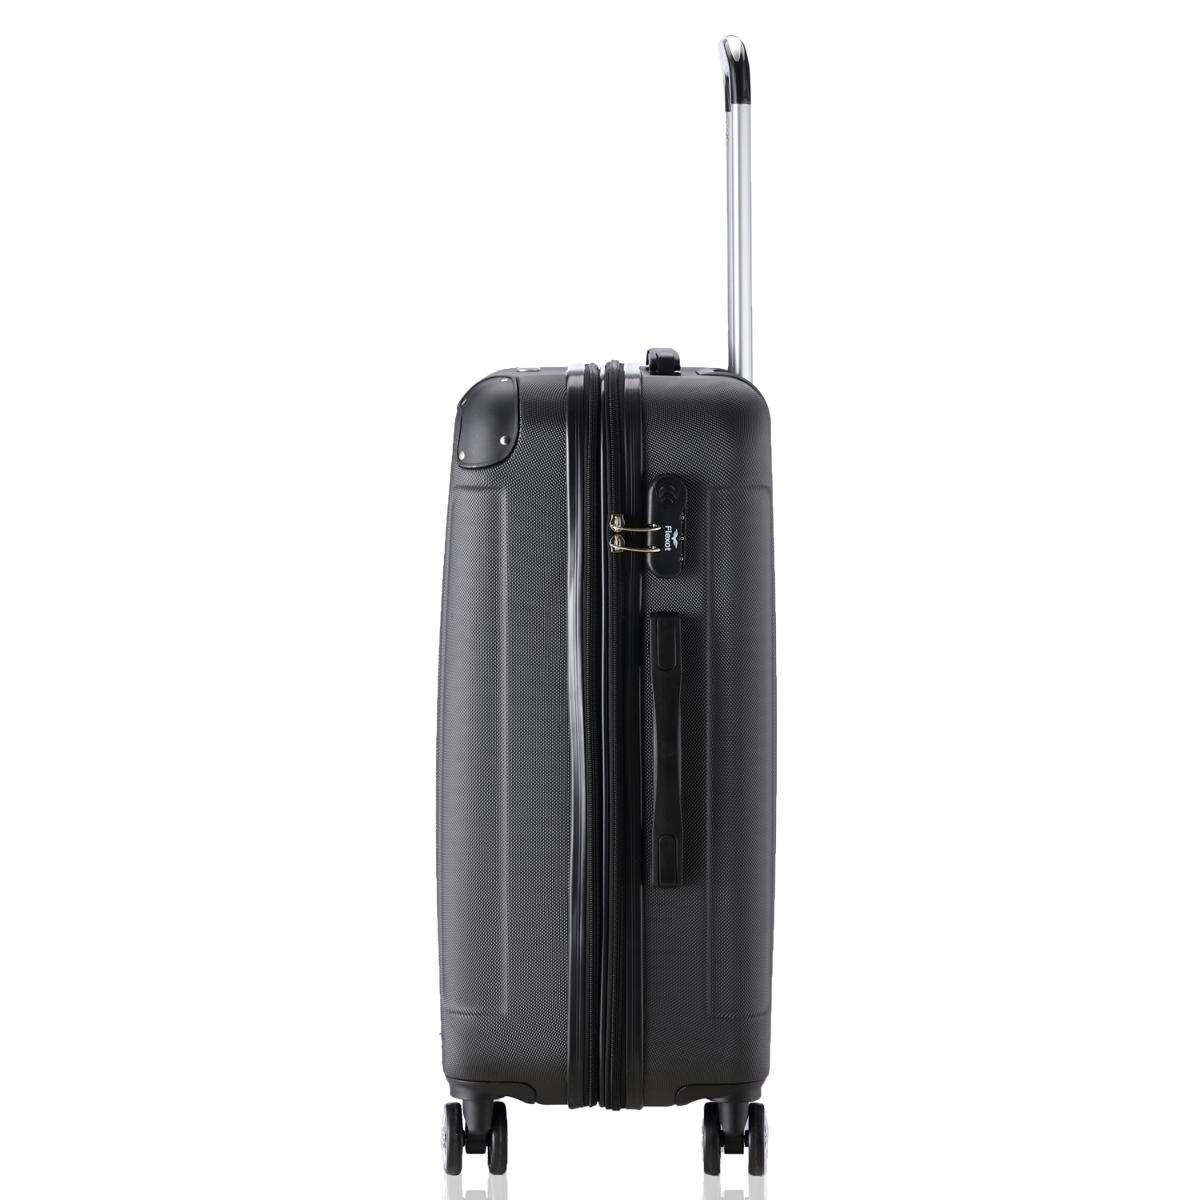 Koffer-Flexot-2045-Hartschalenkoffer-Trolley-Kofferset-Reisekoffer-M-L-XL-Set Indexbild 37